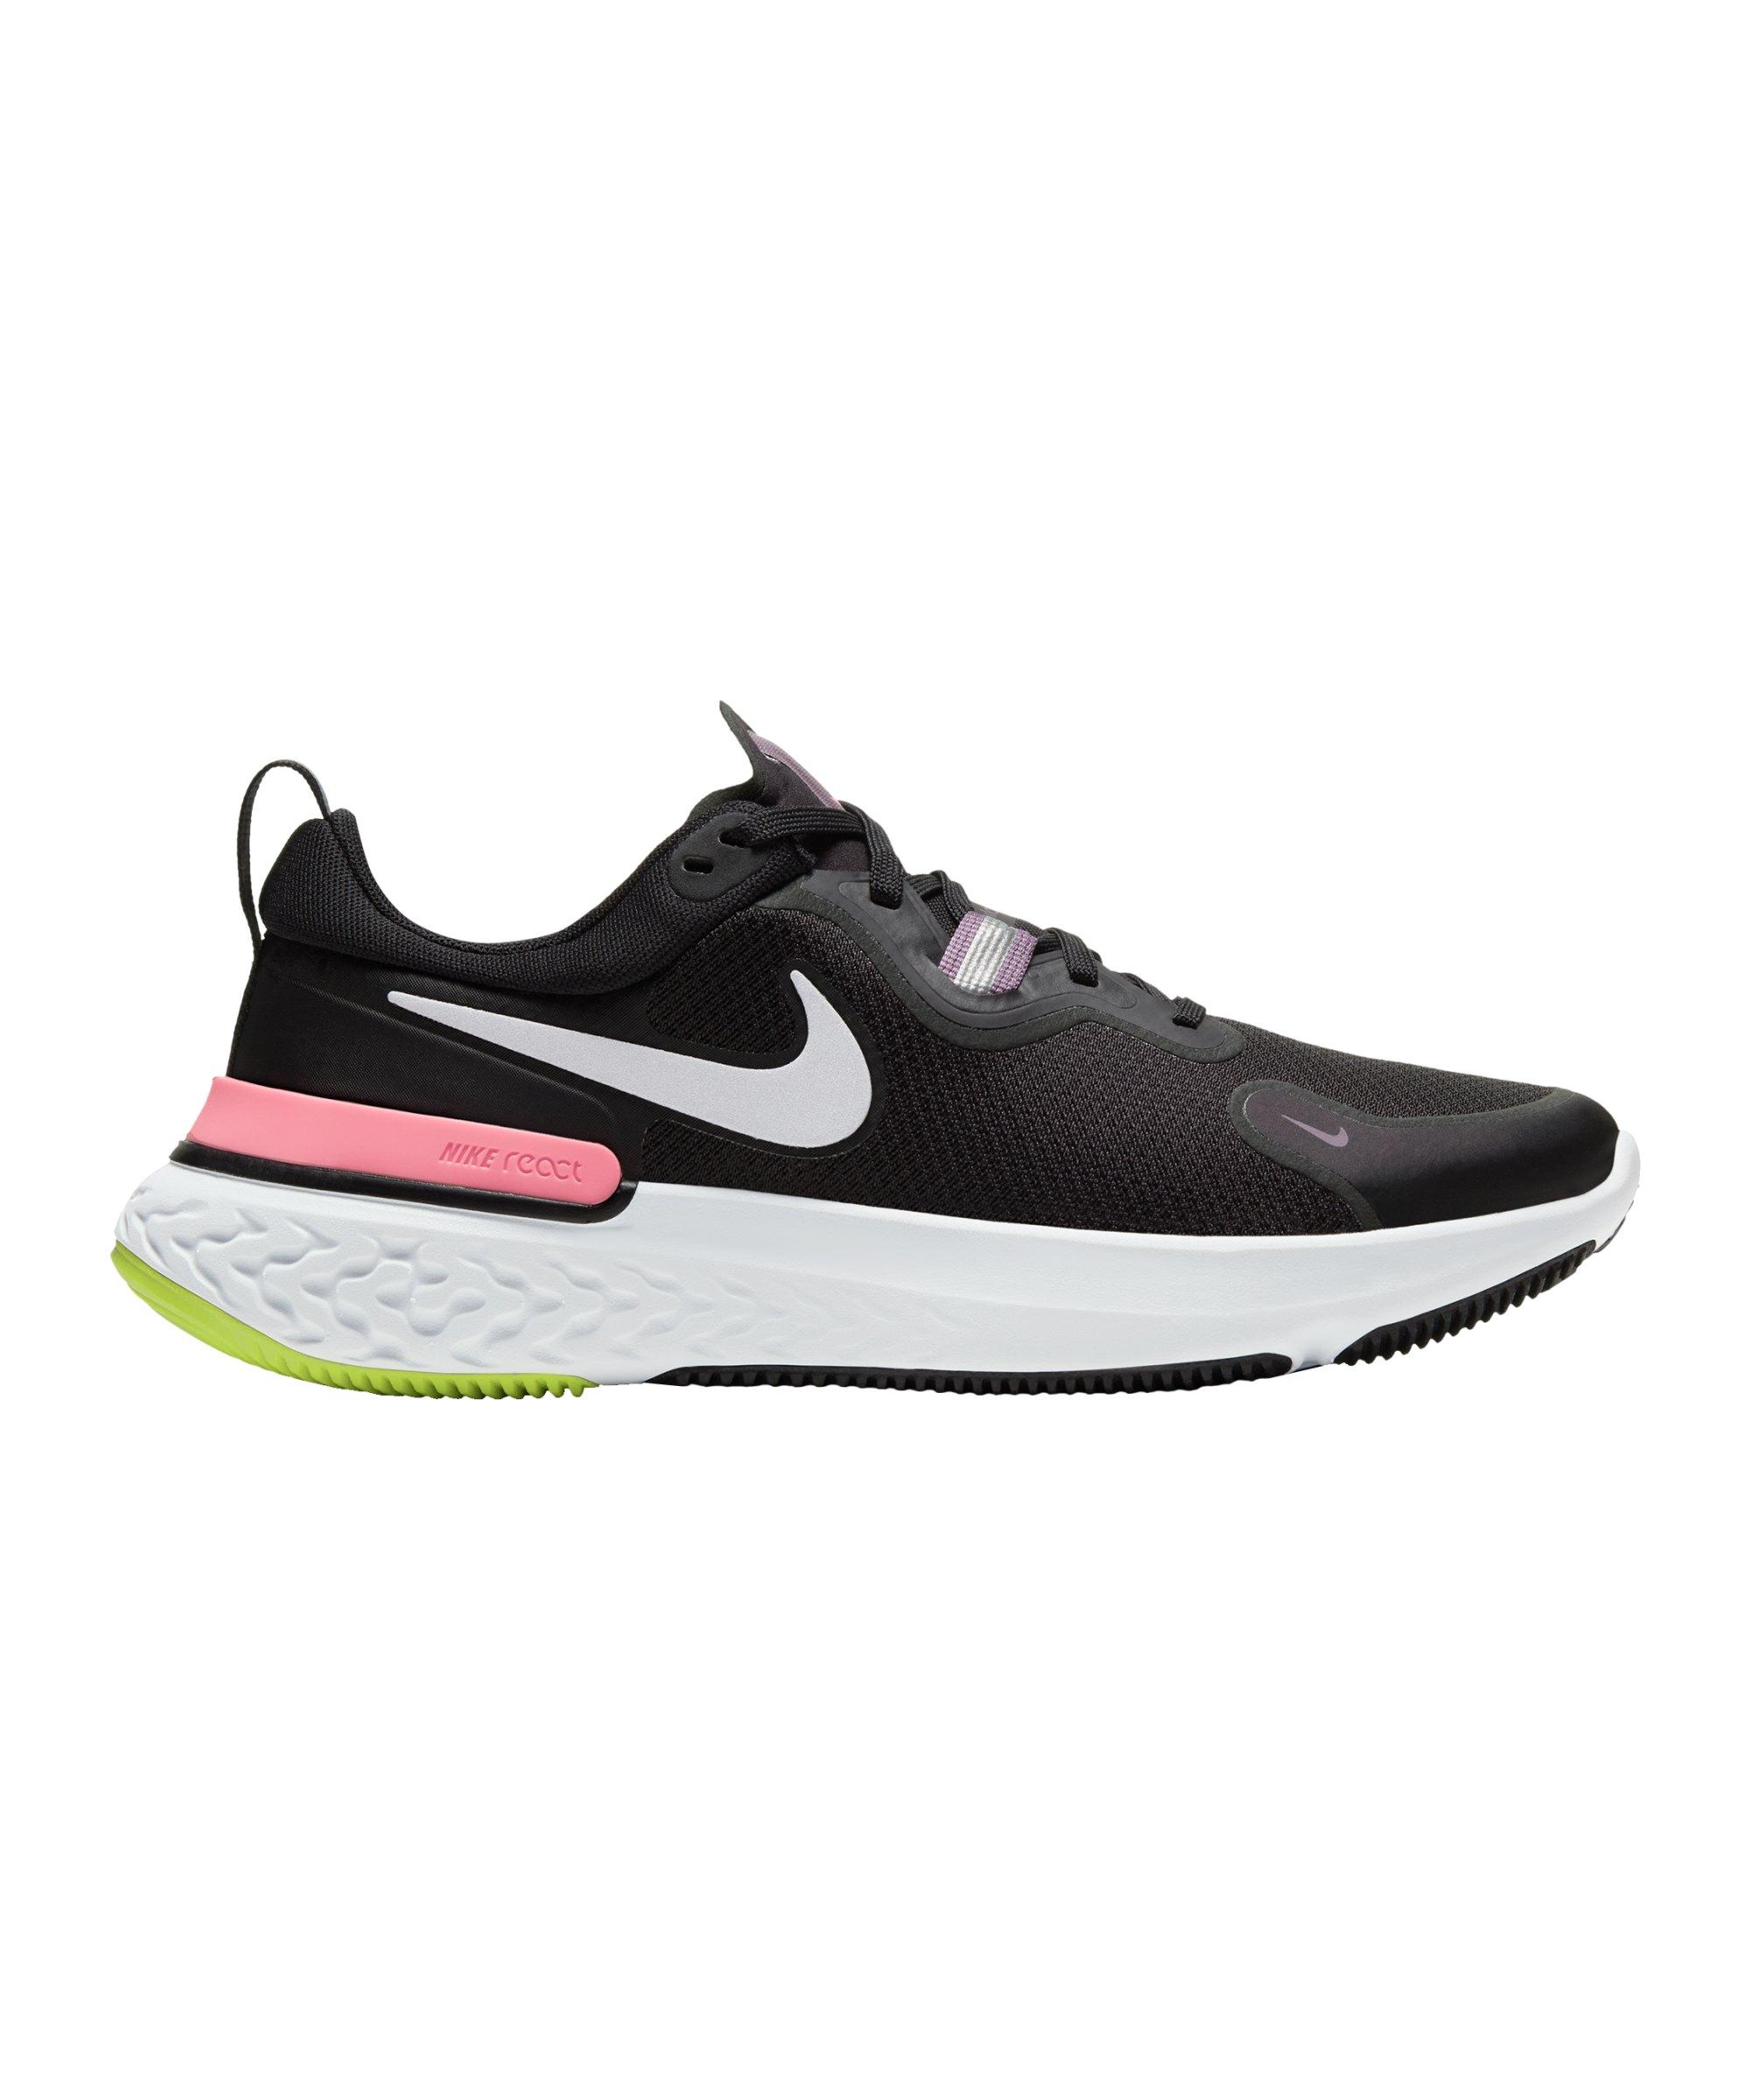 Nike React Miler Running Damen Schwarz F012 - schwarz